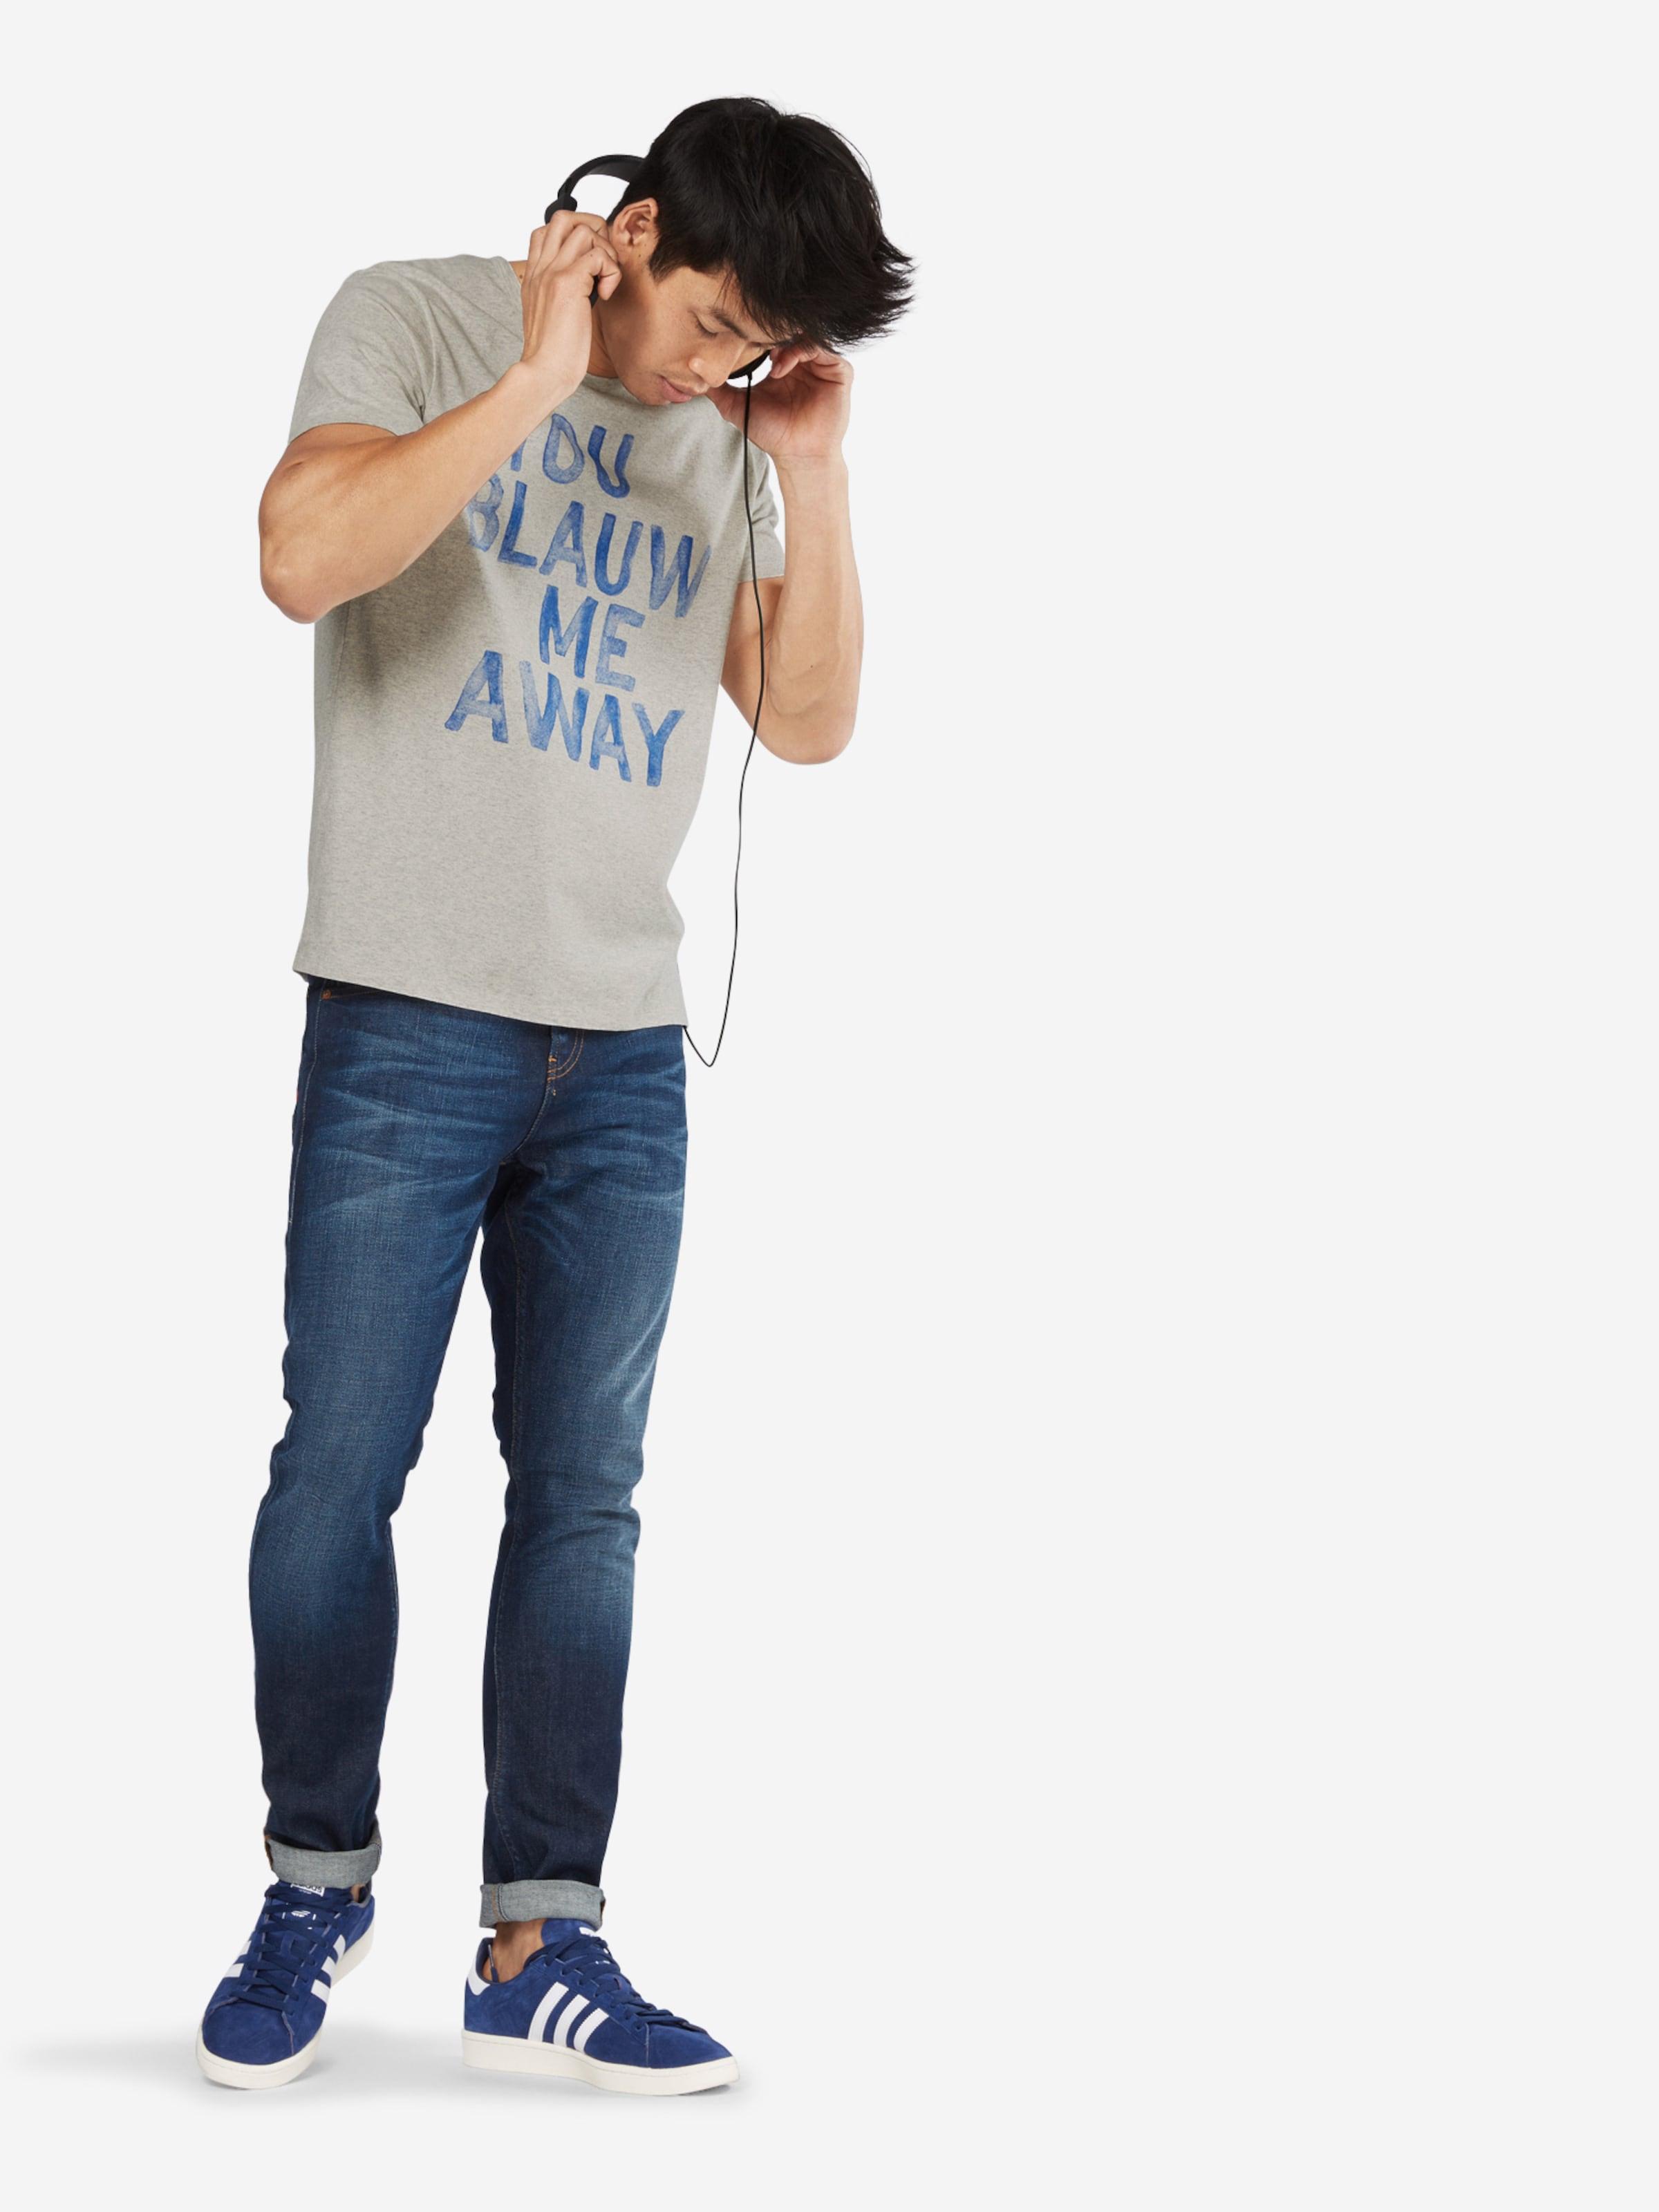 SCOTCH & SODA T-Shirt 'Ams Blauw tee with artwork' Großer Verkauf CxpdRk